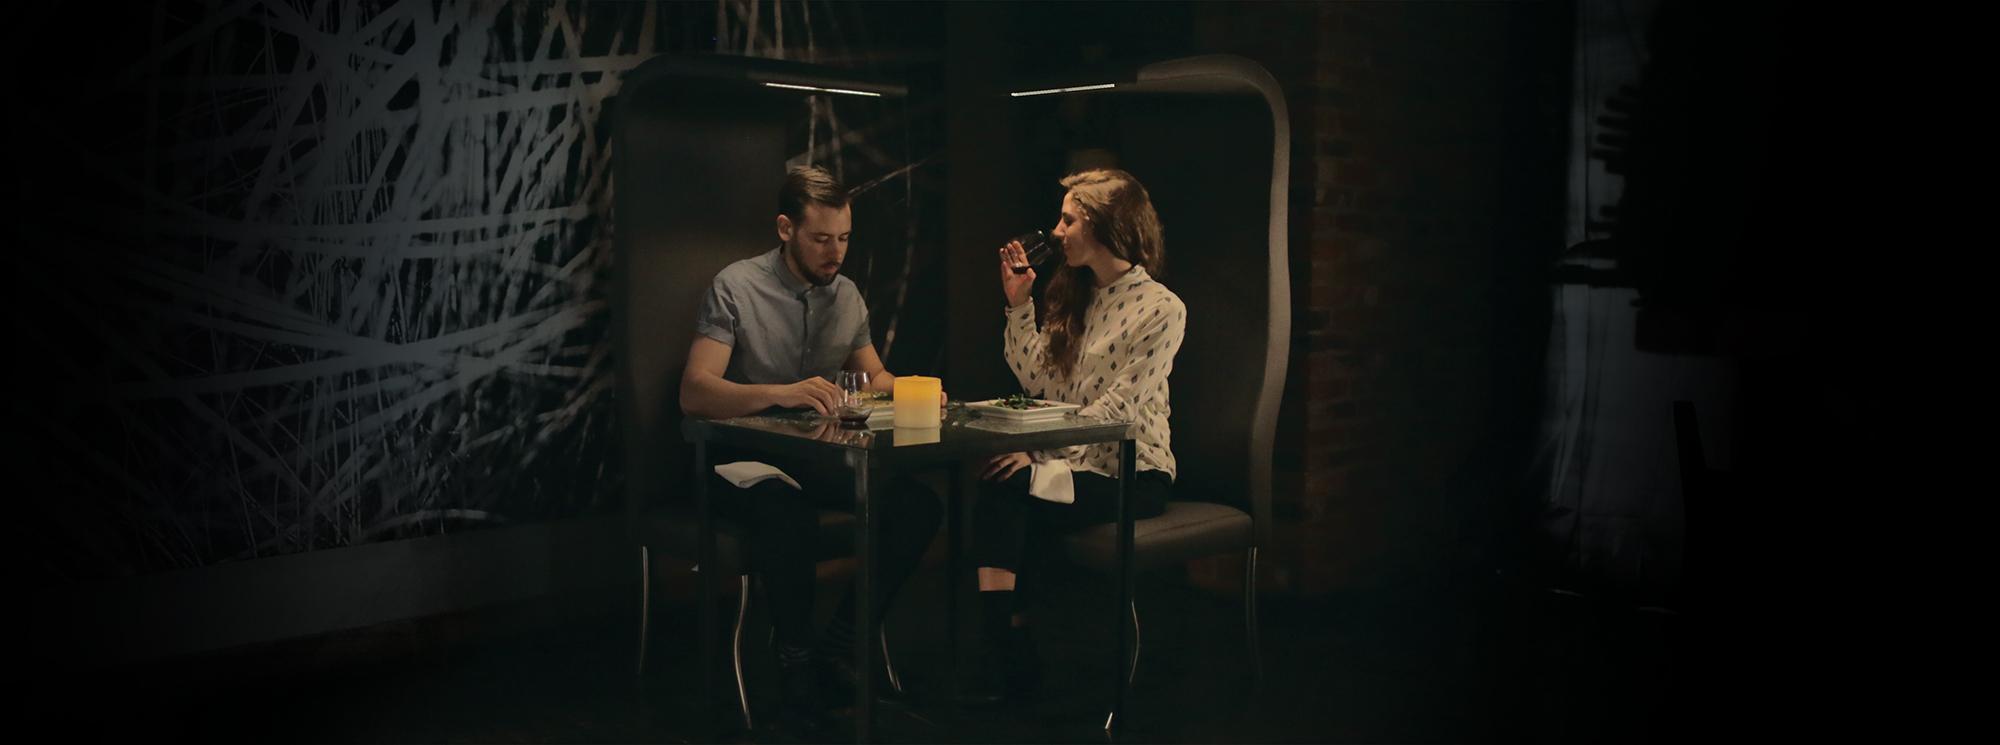 Photography By: Peter Schnobb + Models: Jakob Van Regan & Maria Beamish + Location: Origin Restaurant, Toronto